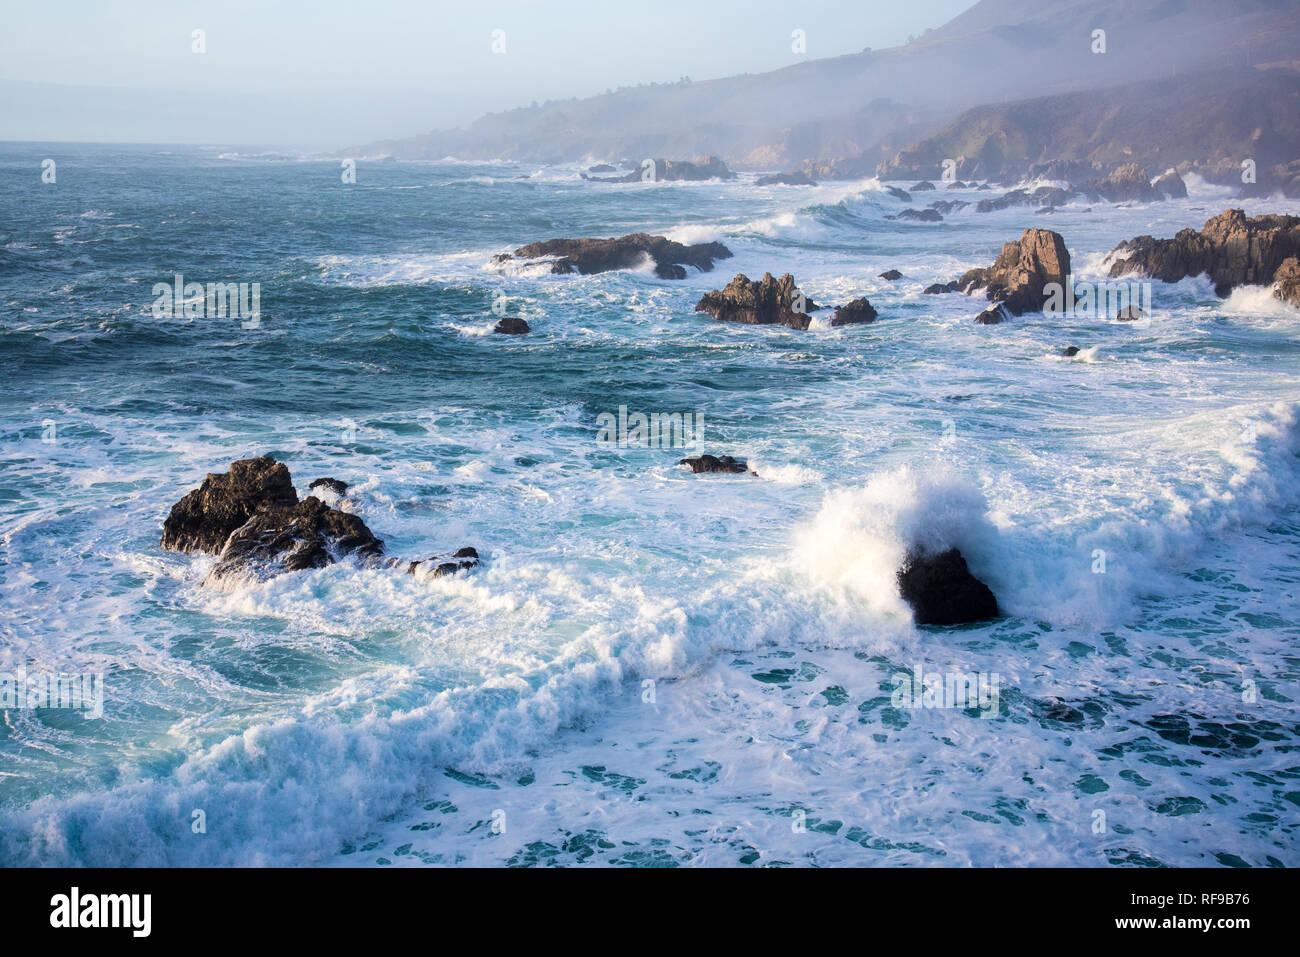 Crashing waves and rocky shores of the Monterey Peninsula. Stock Photo